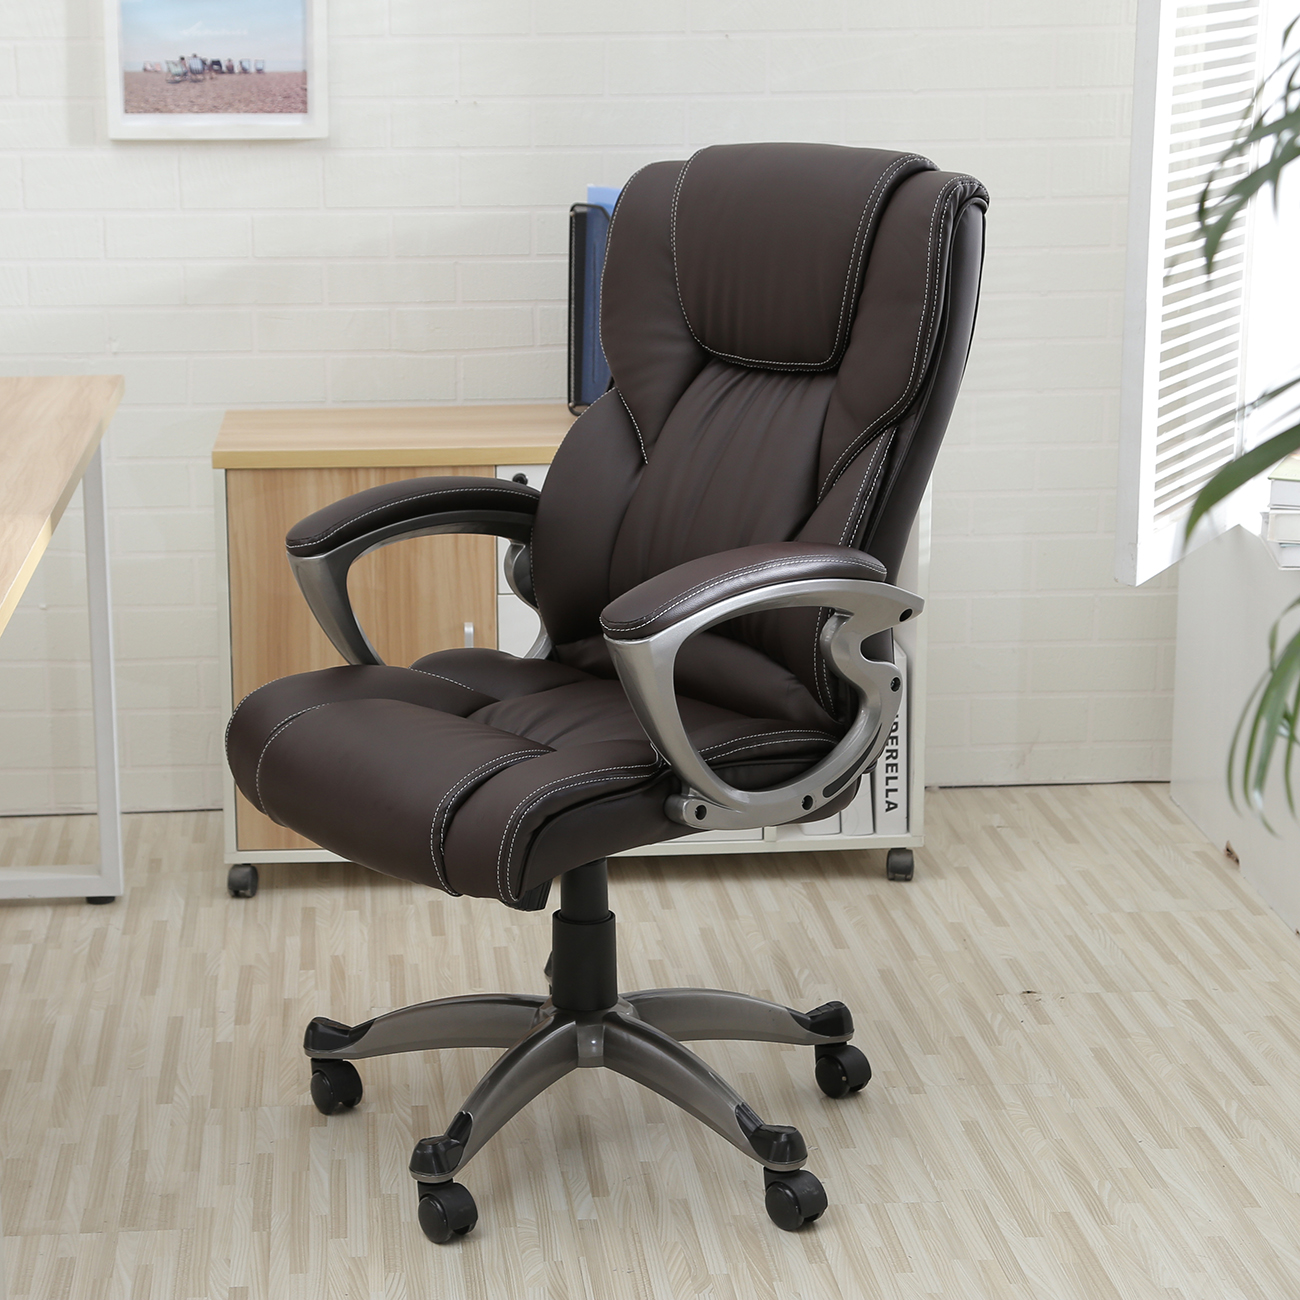 Executive Office Chair HighBack Task Ergonomic Computer Desk